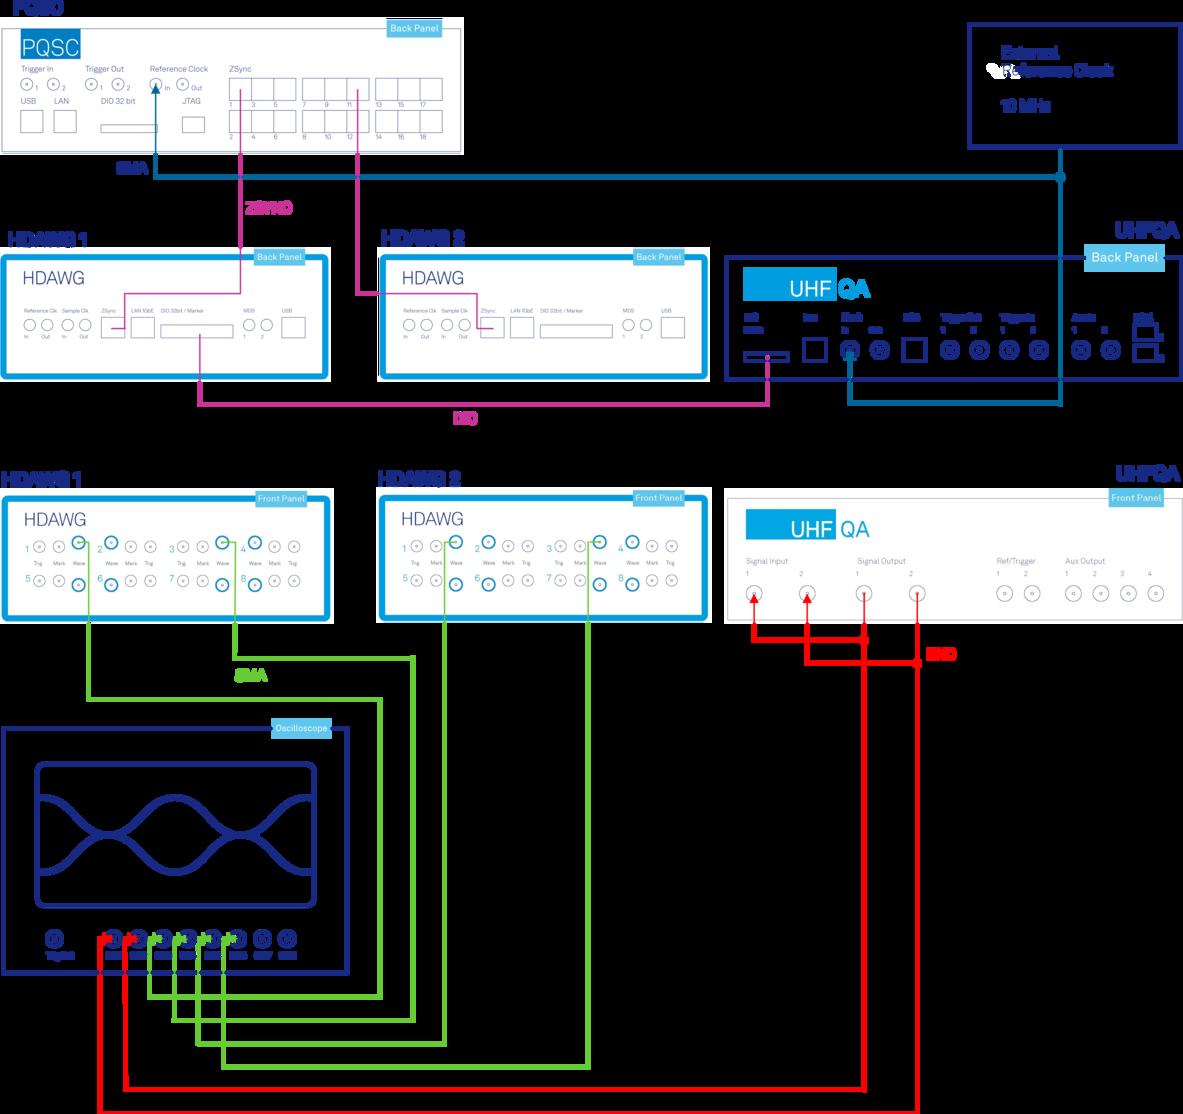 figure_7_experimental_setup.png